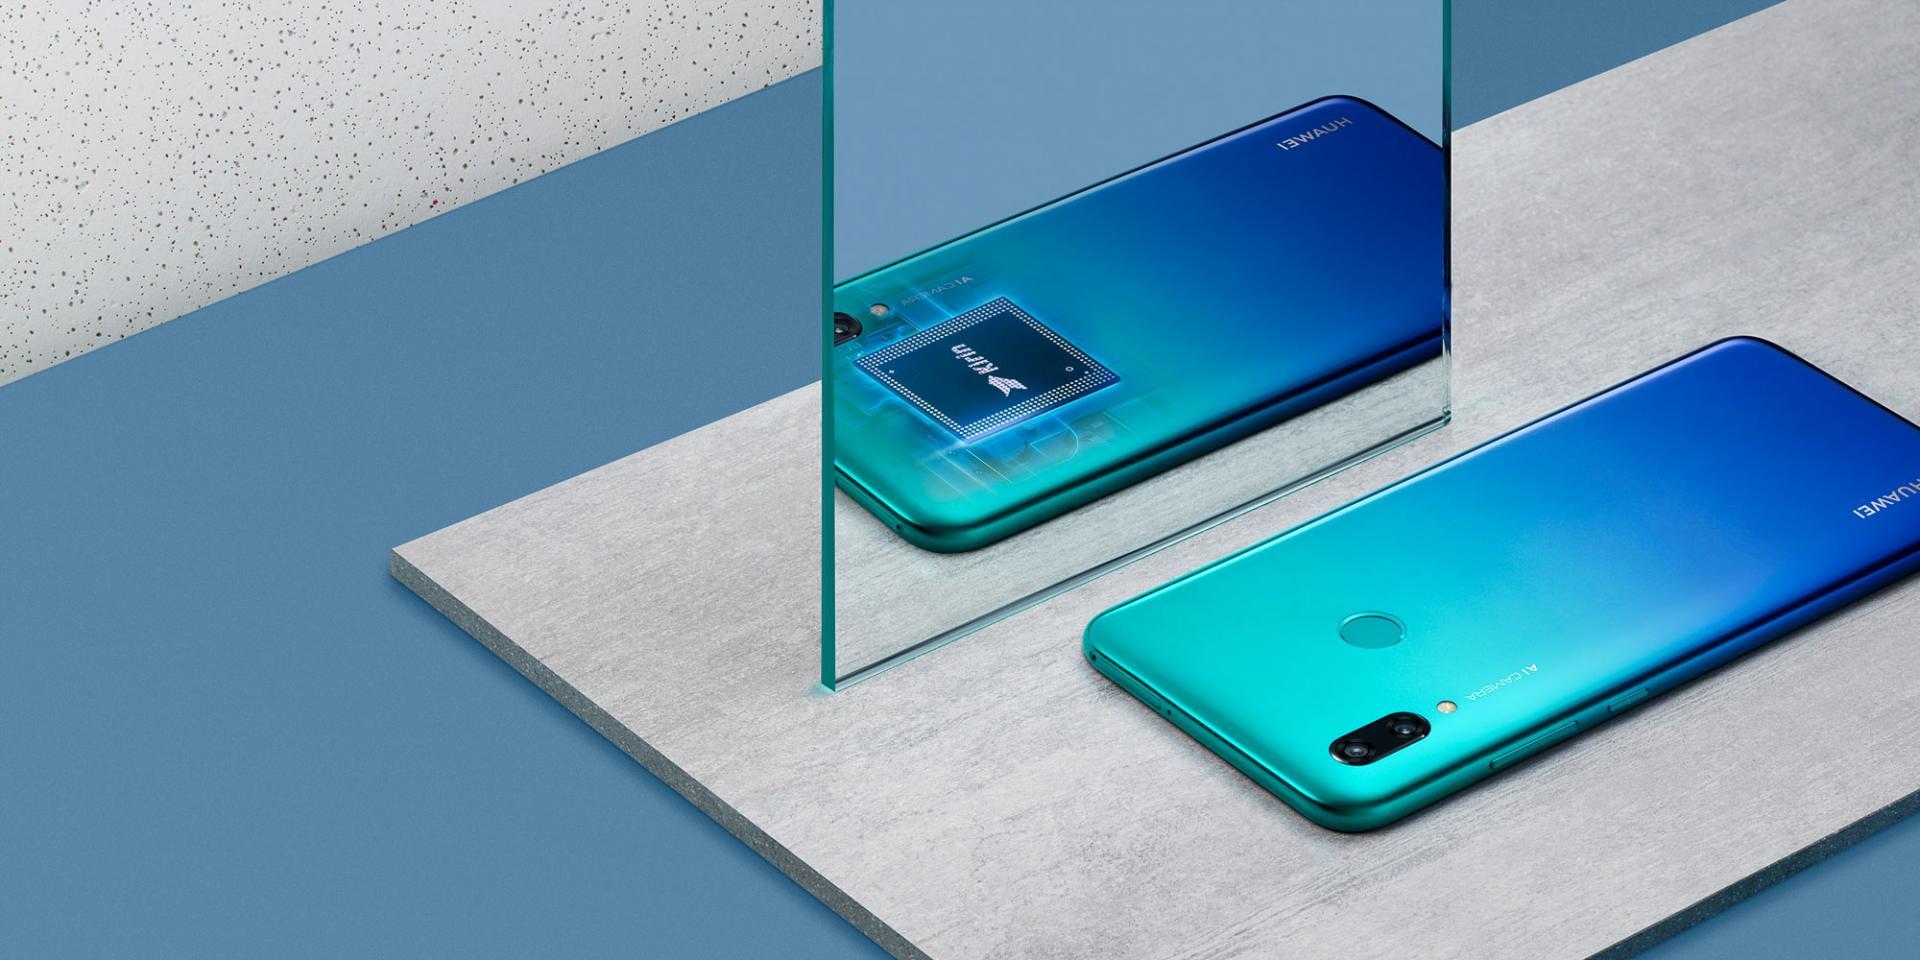 Huawei PSmart 2019 скоро появится впродаже за14770 рублей